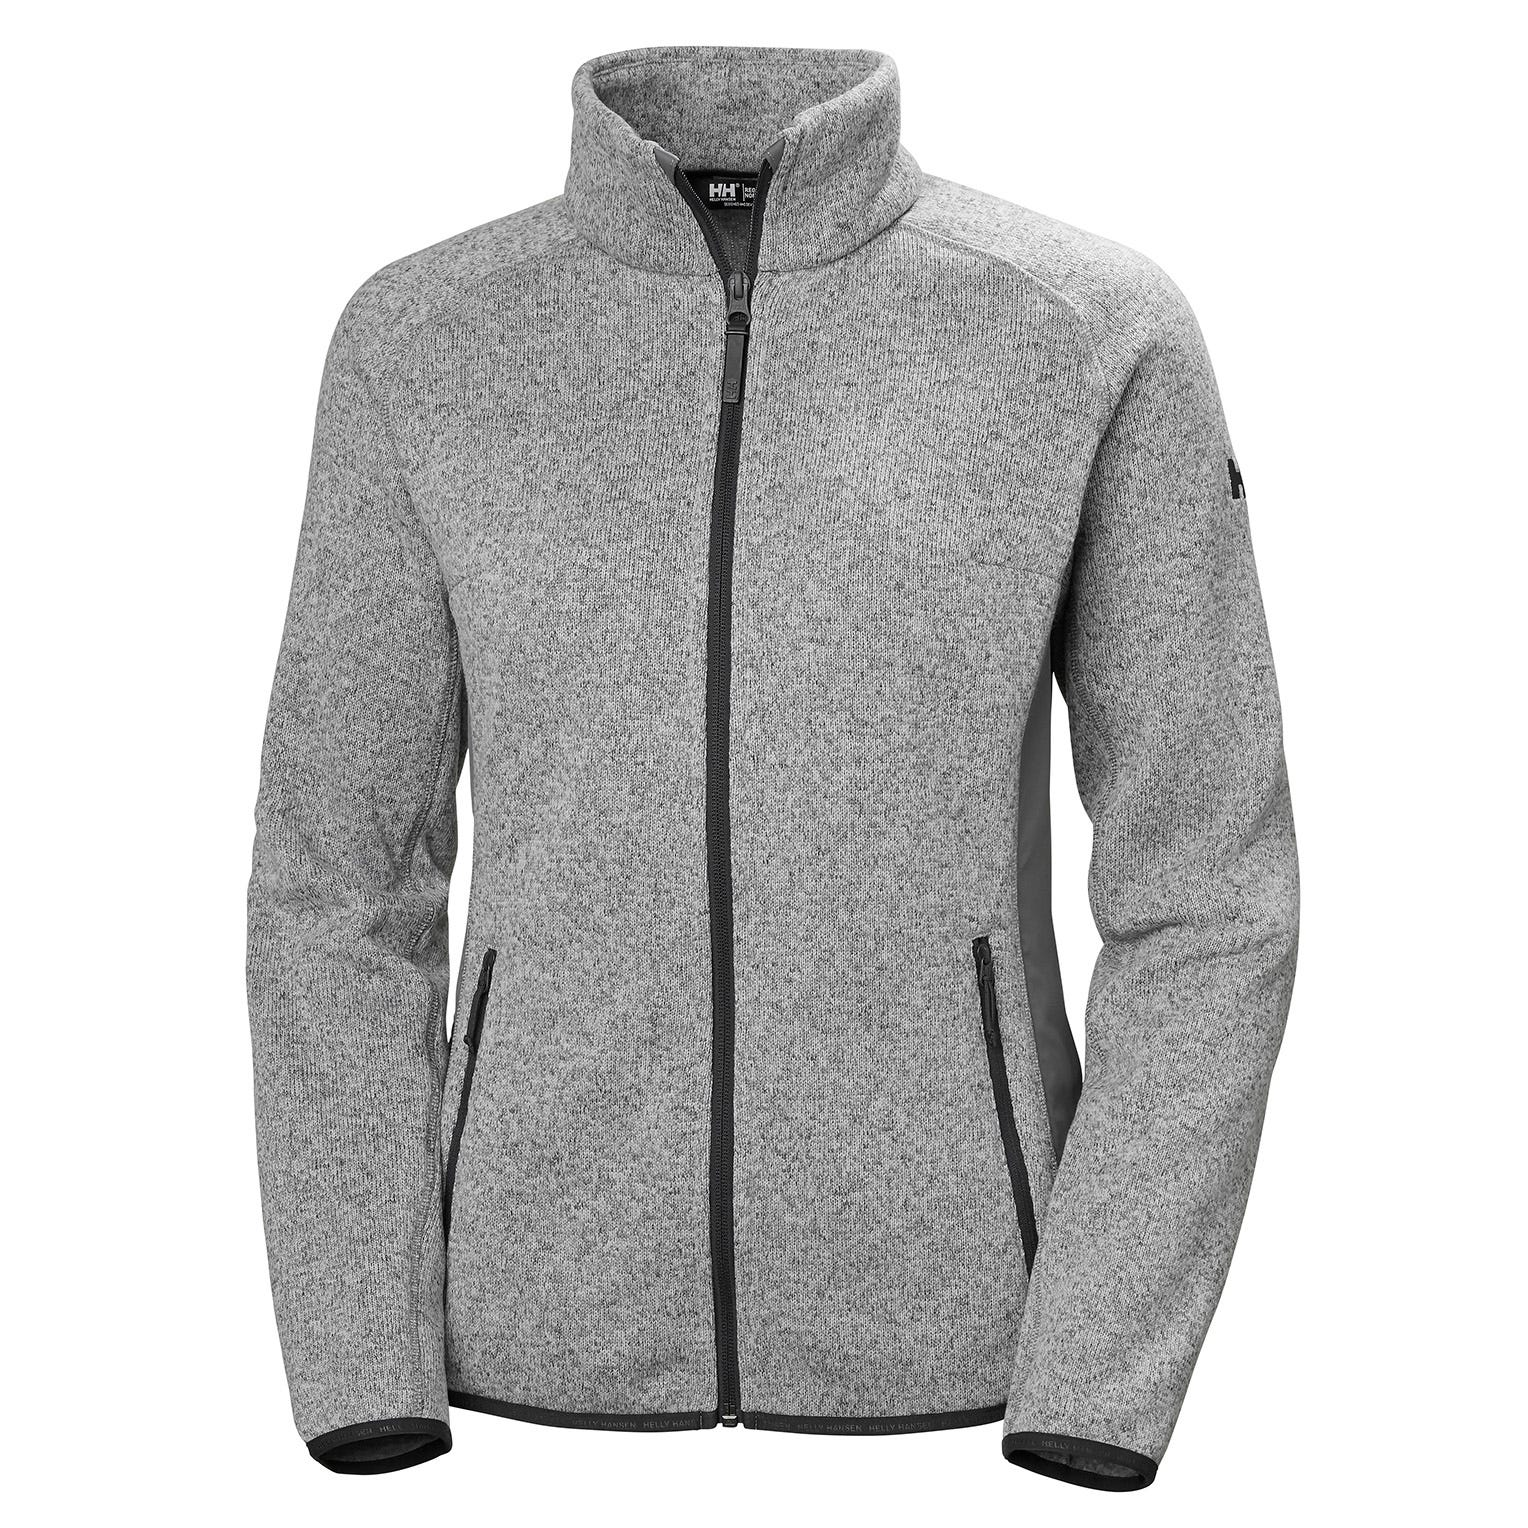 Chaqueta Mujer Helly Hansen W Varde Fleece Jacket